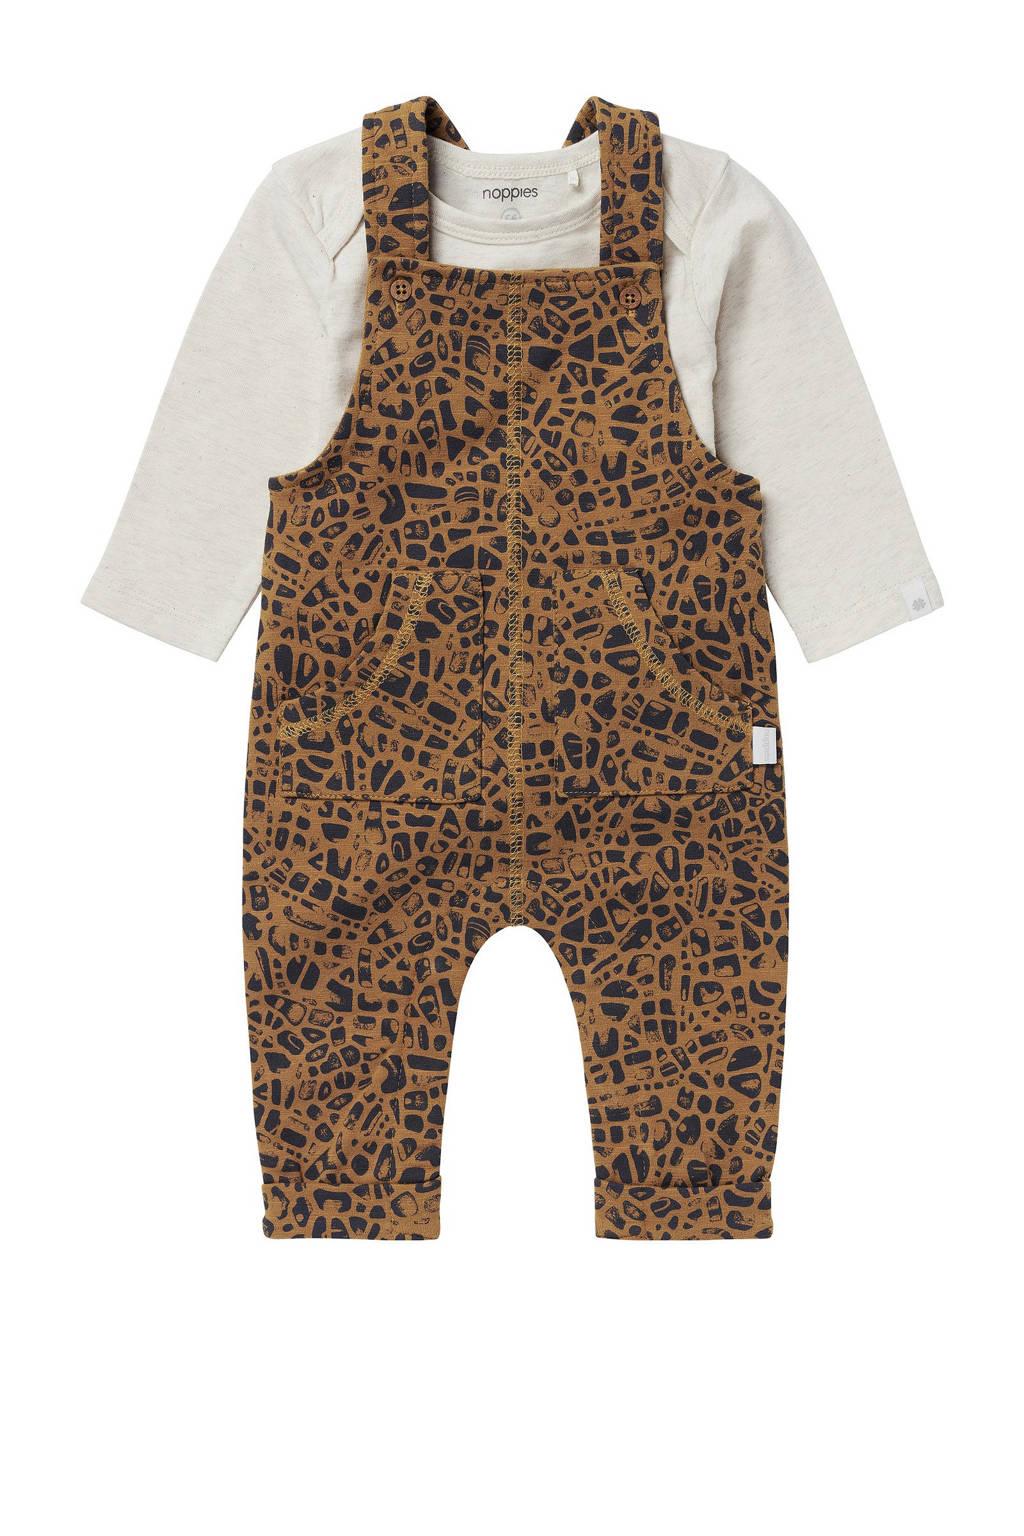 Noppies newborn baby tuinbroek + romper ecru/bruin/zwart, Bruin/ecru/zwart